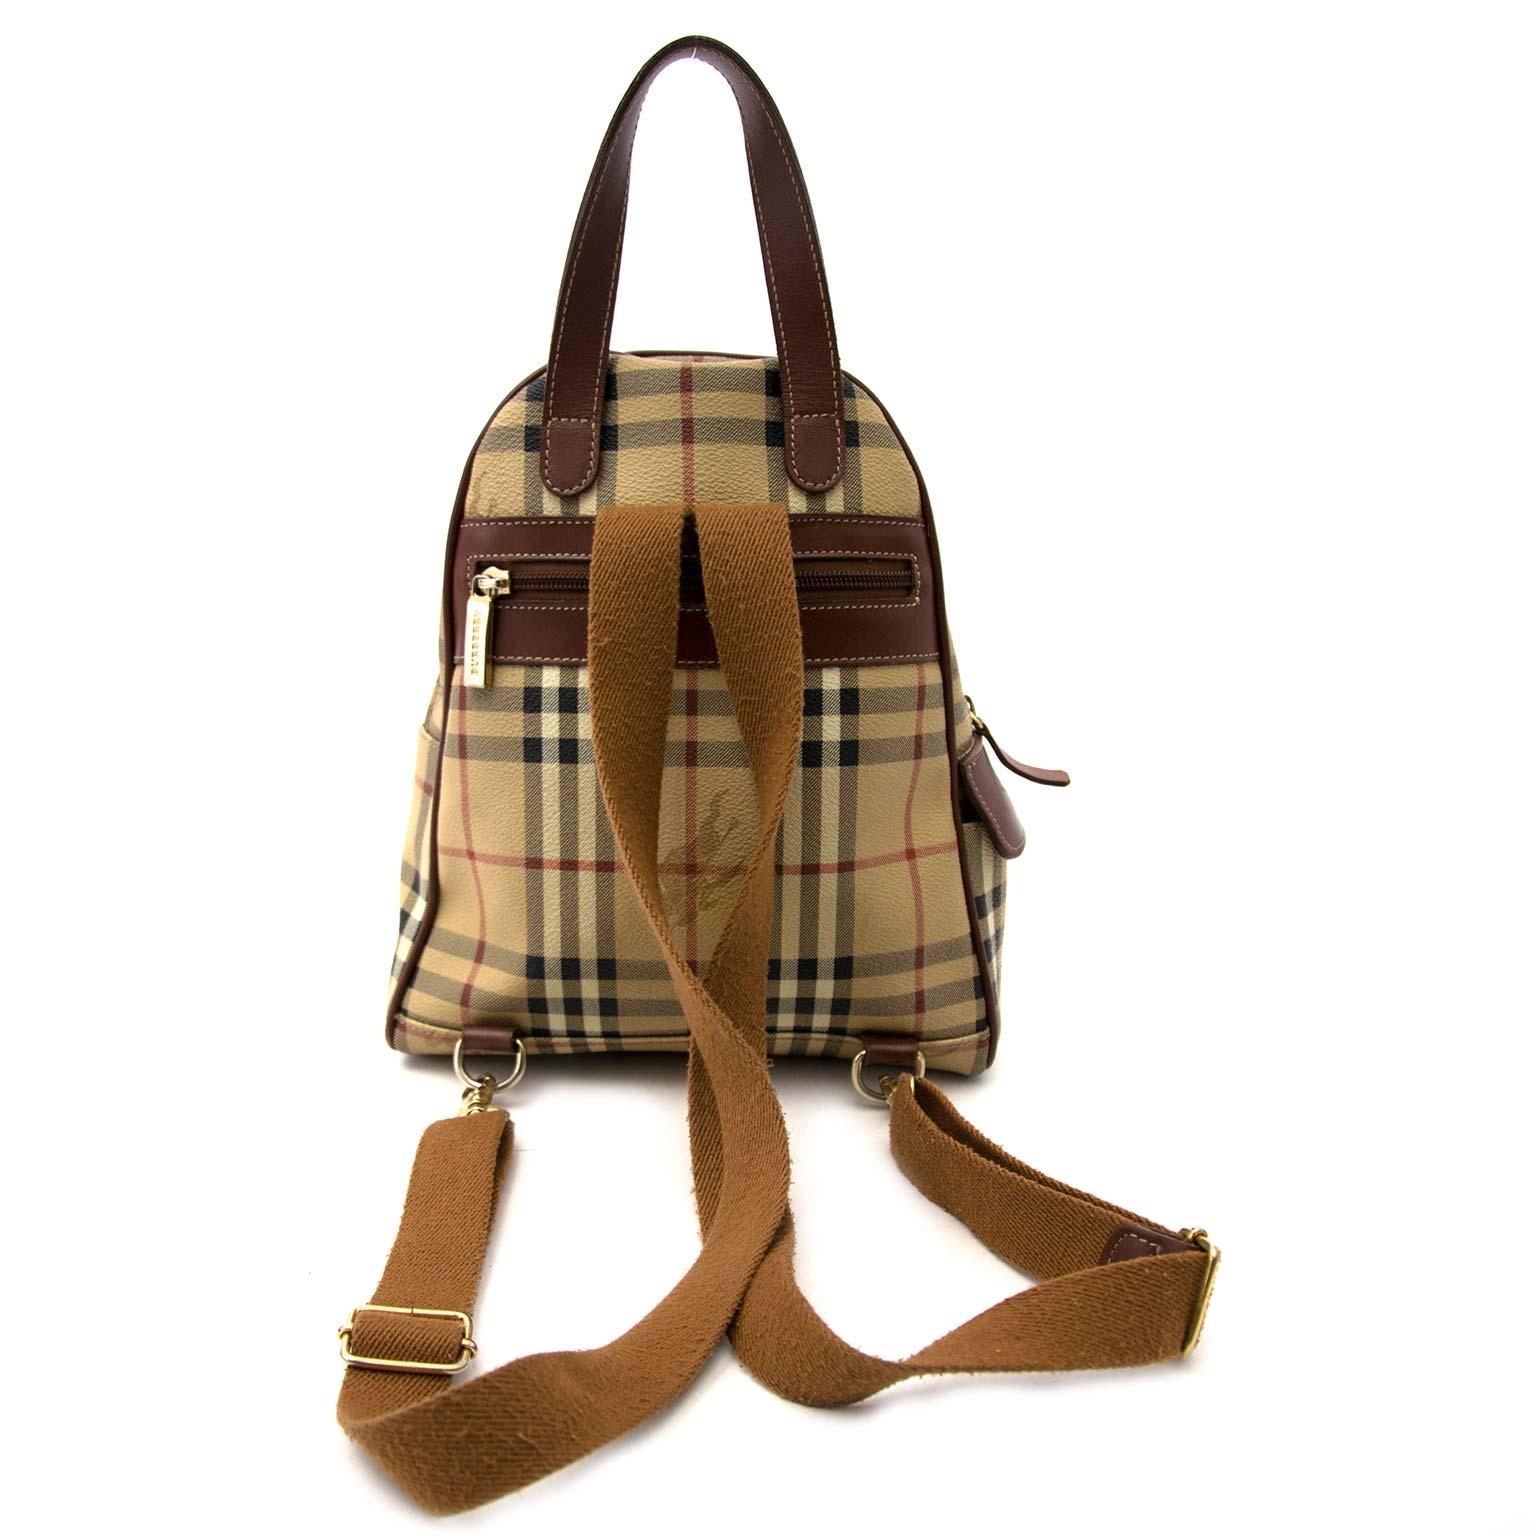 acheter en ligne seconde main Burberry Beige Vintage Backpack